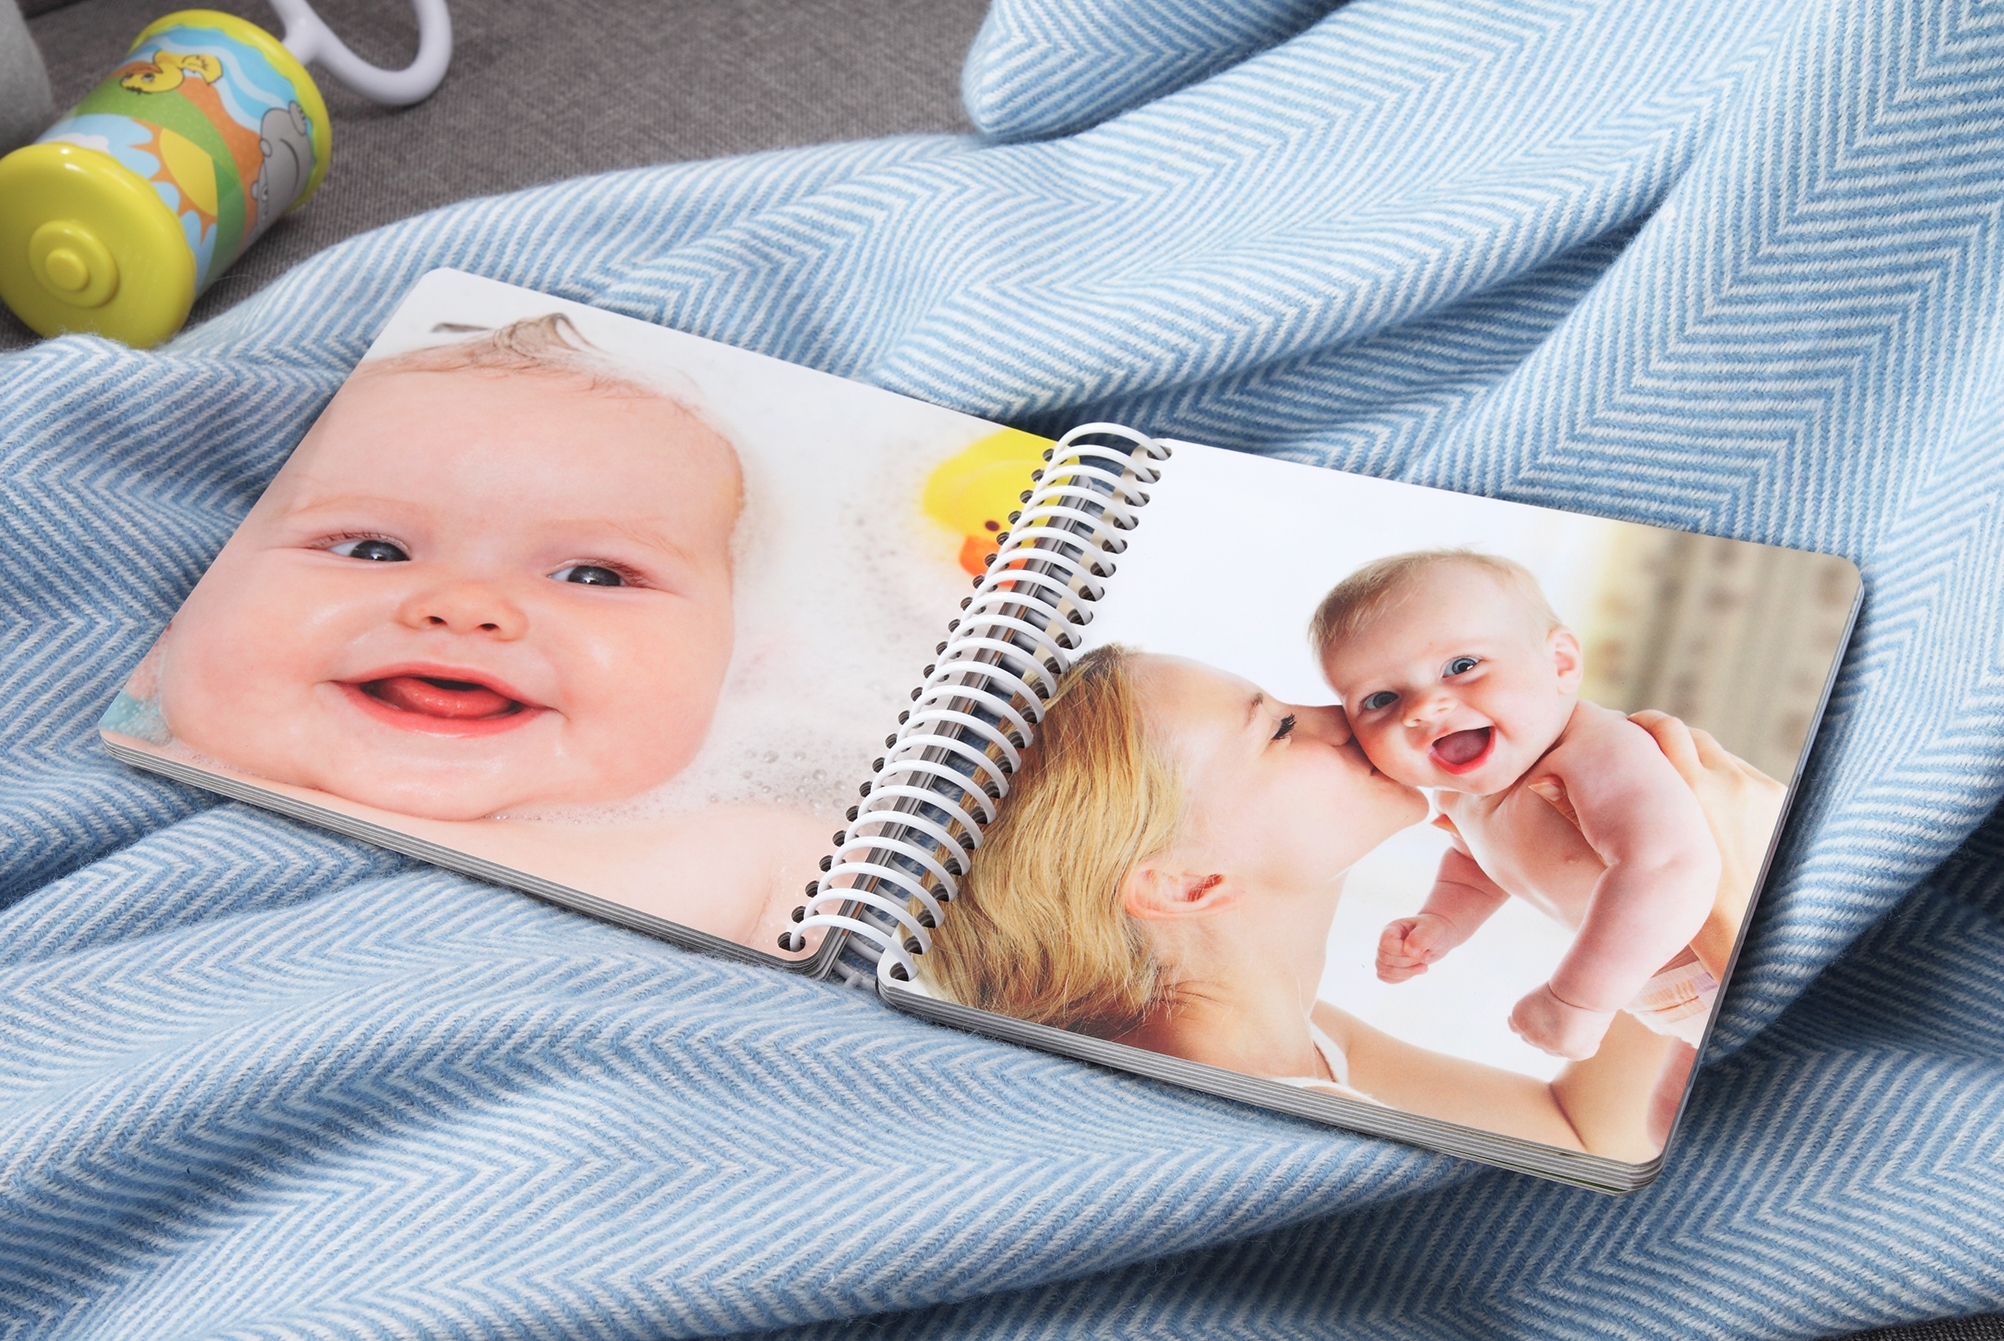 miminko, fotokniha dětská, kniha, dítě